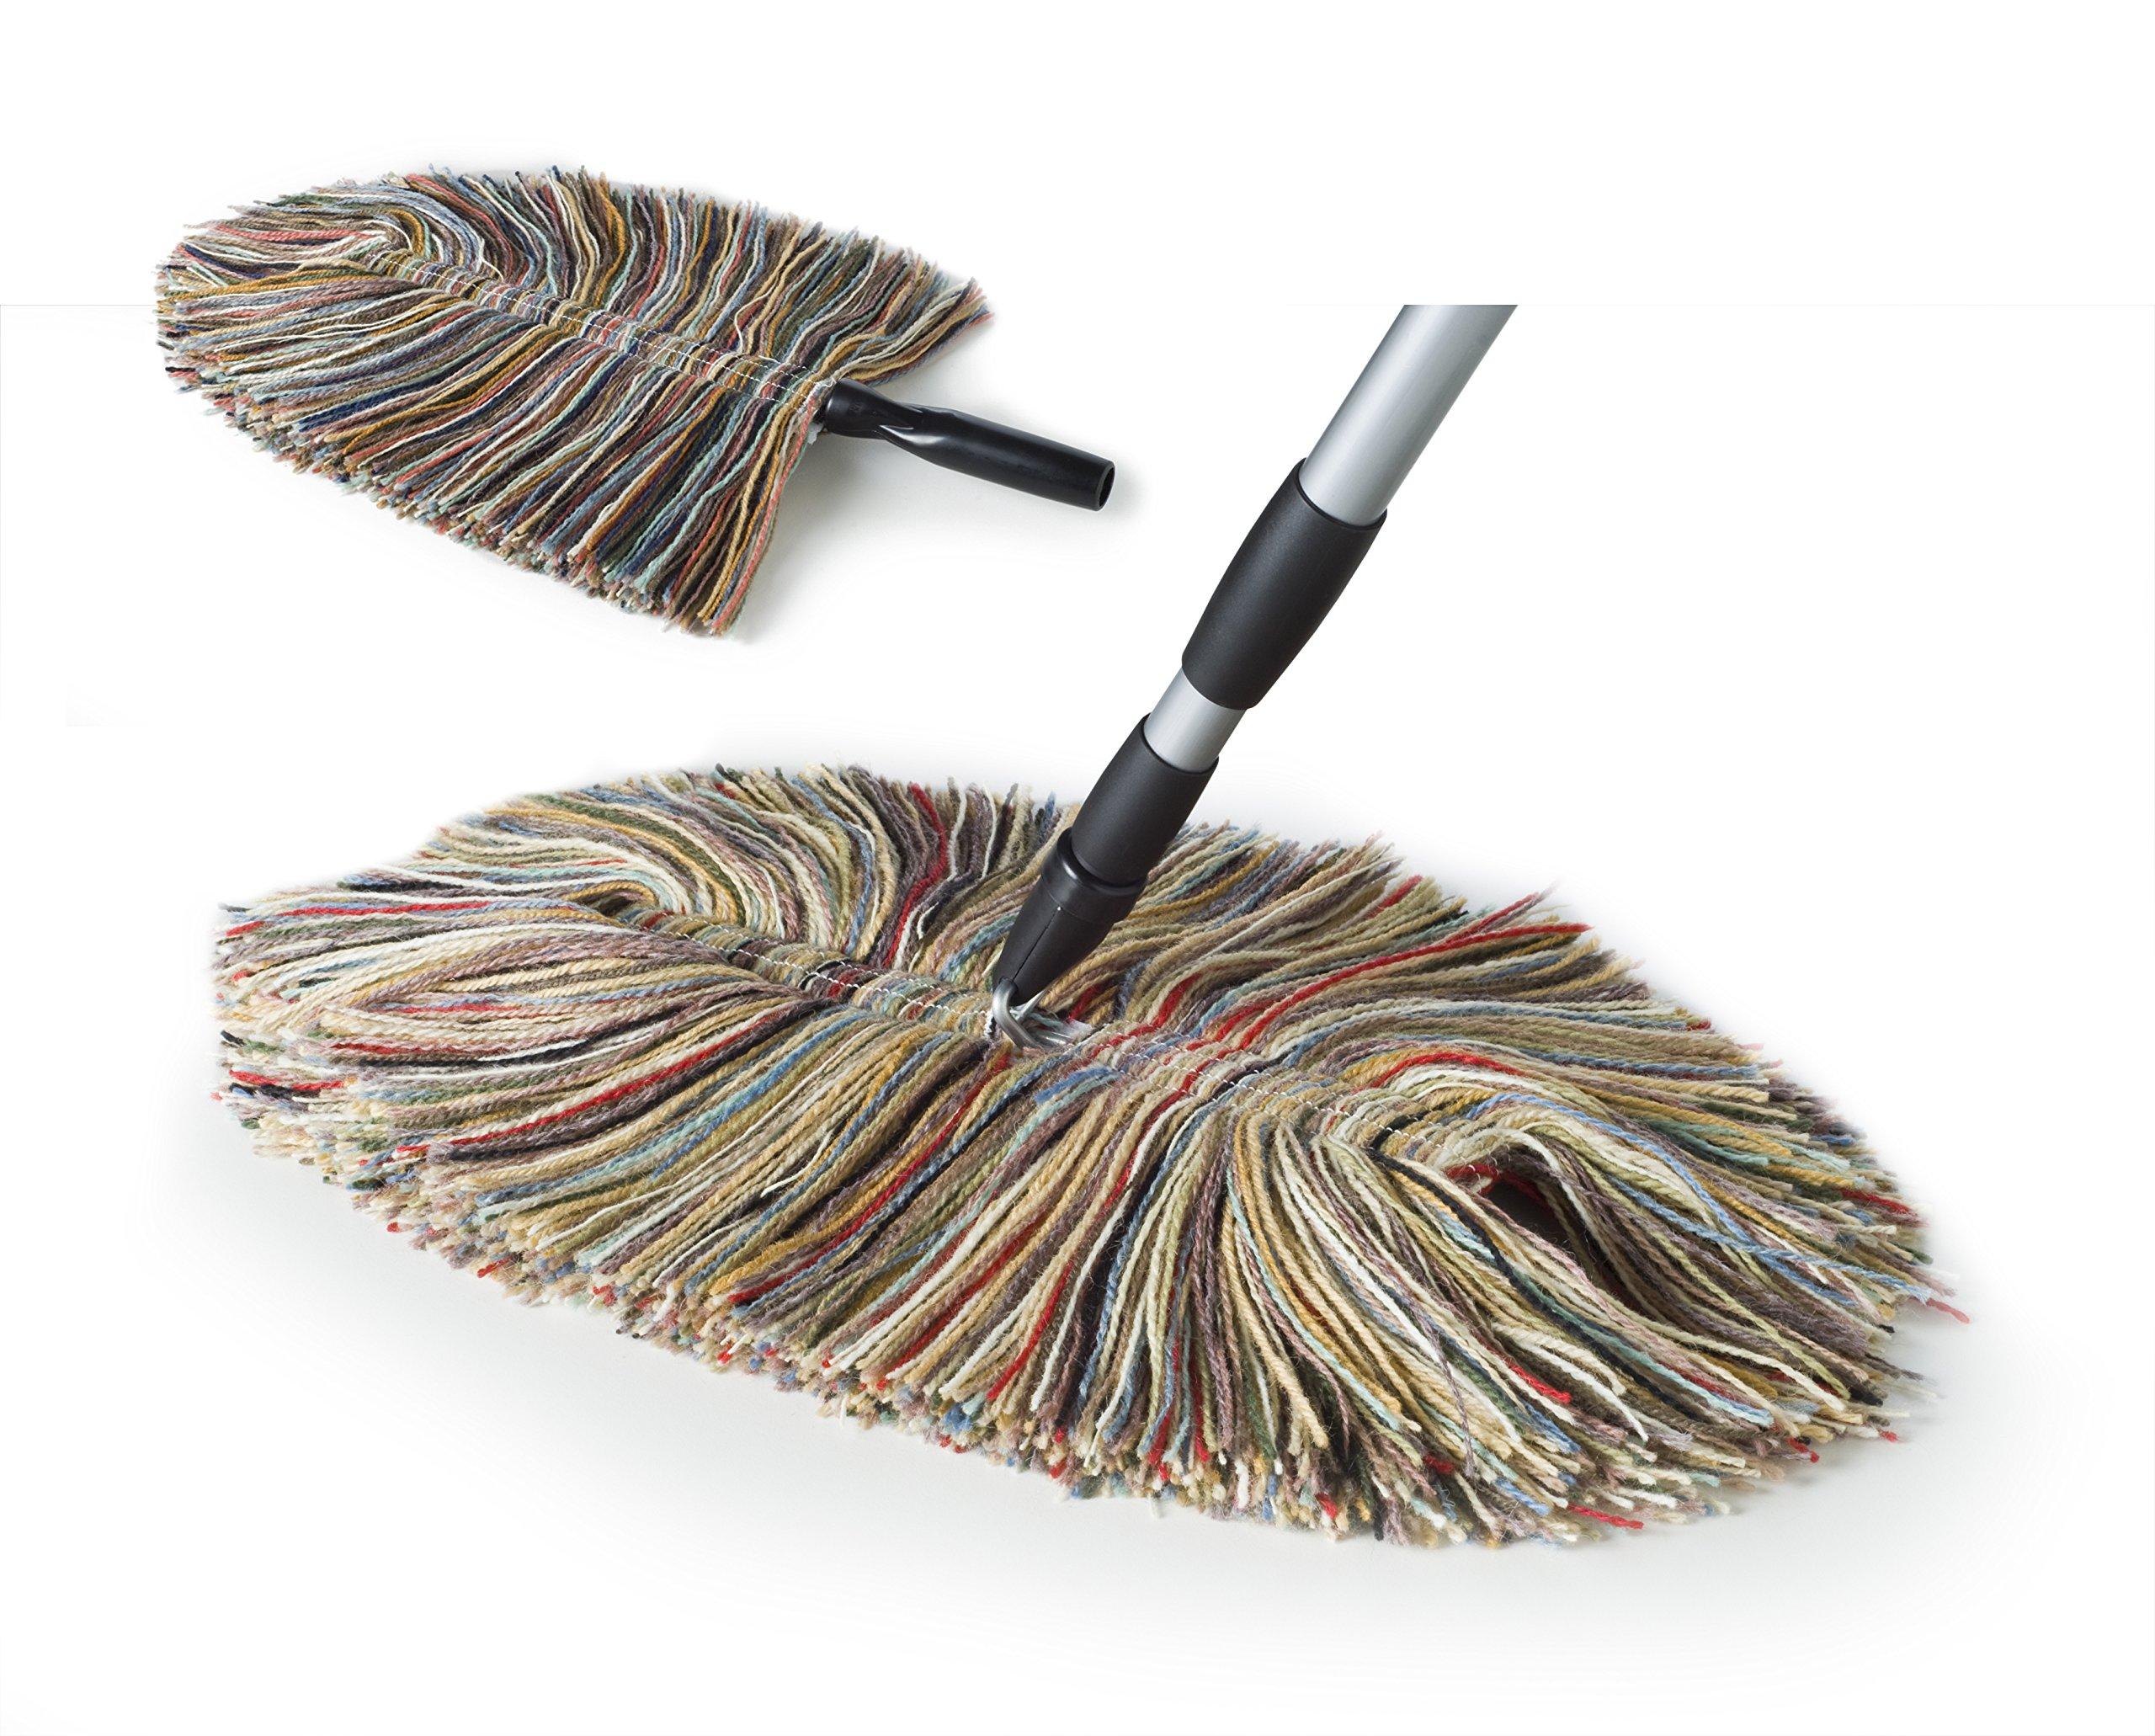 Sladust All Wool Dust Mop with Hand Duster by Sladust